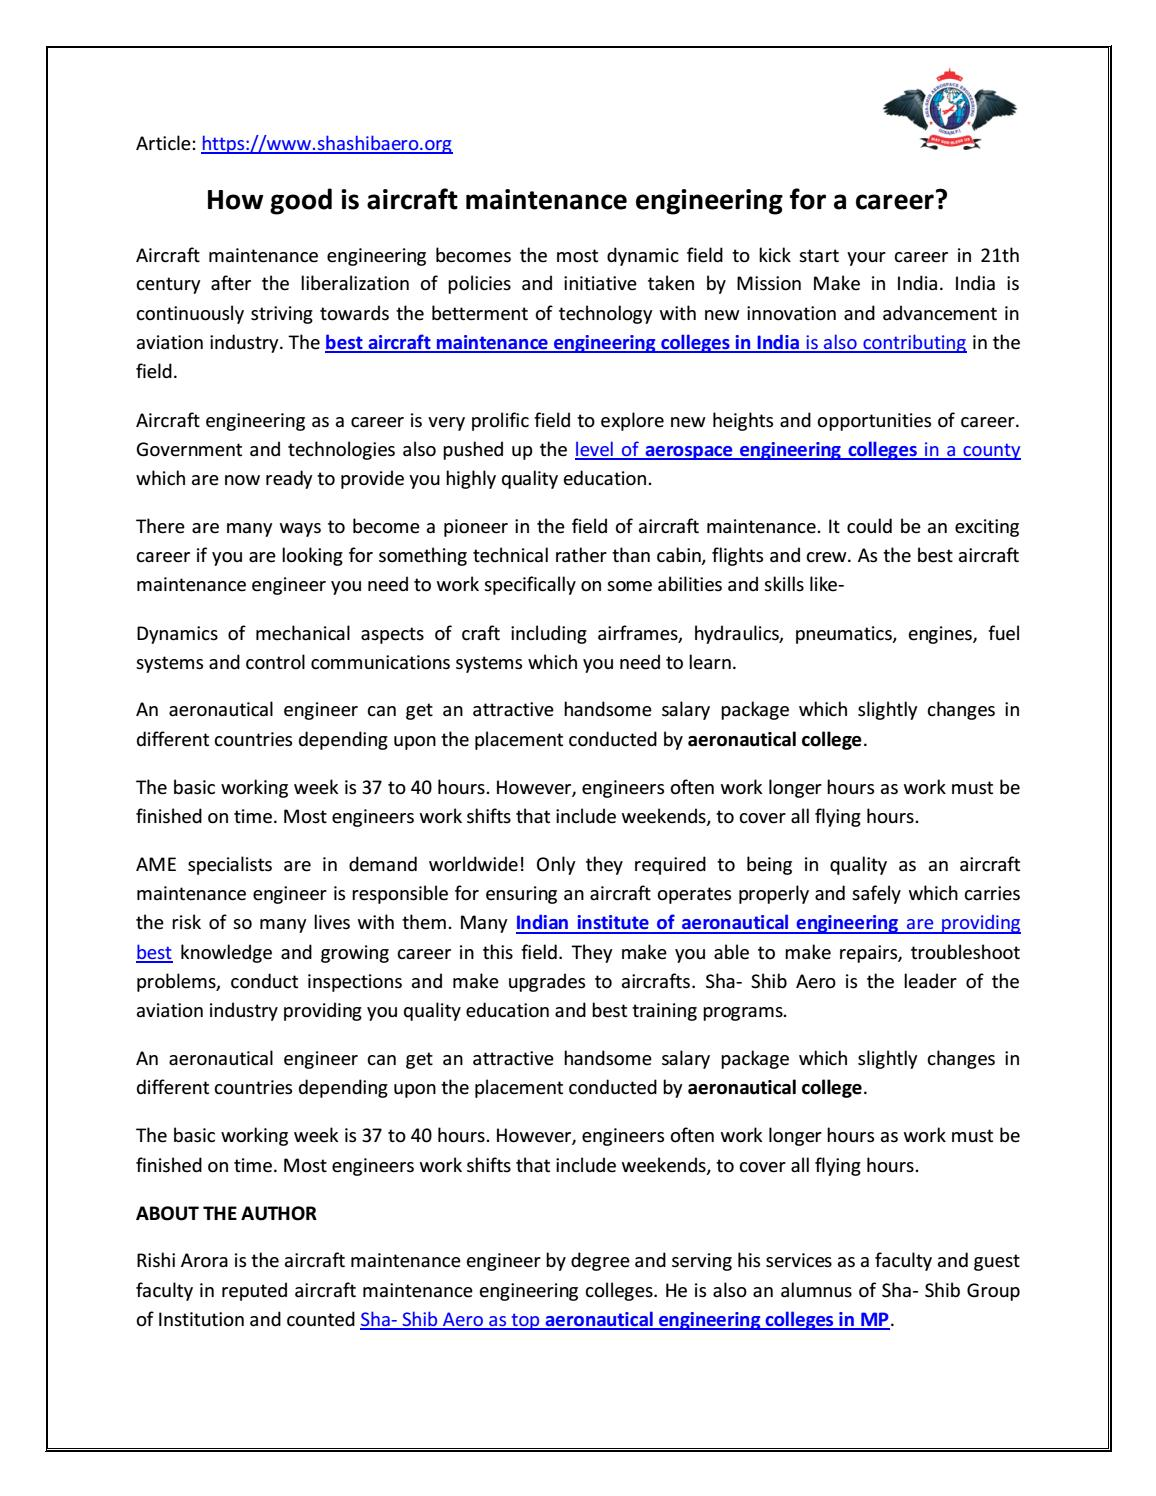 How Good Is Aircraft Maintenance Engineering For A Career By Sha Shib Aerospace Engineering Issuu